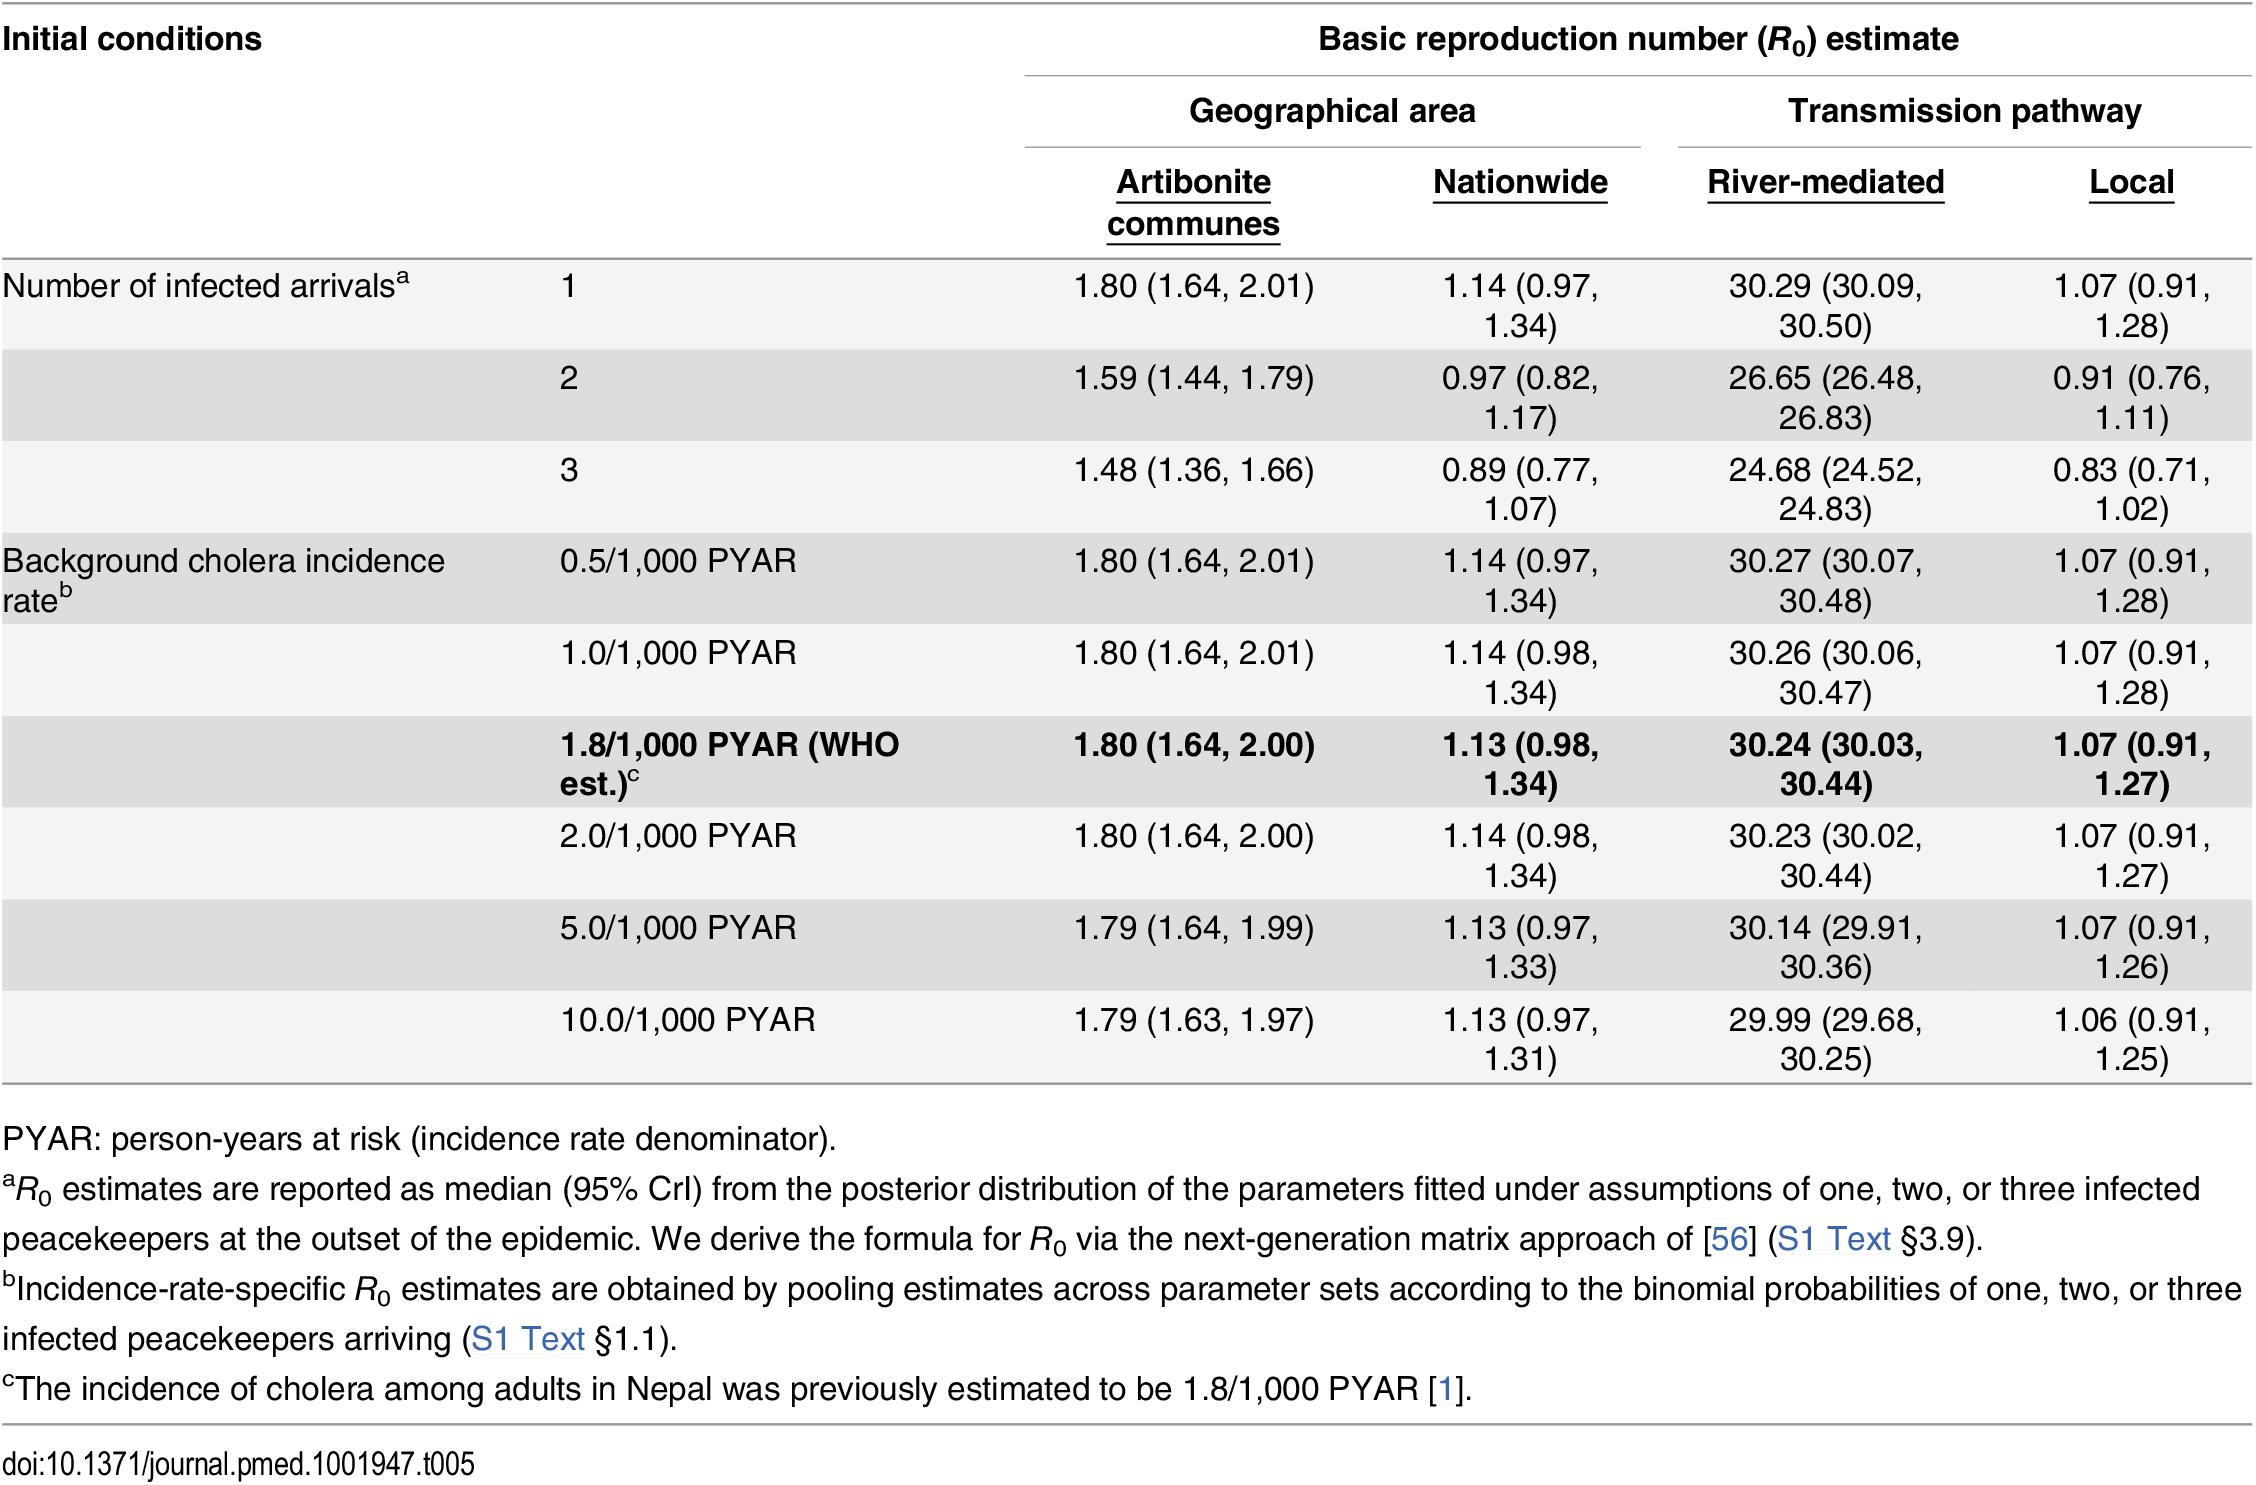 Estimated basic reproduction numbers (<i>R</i><sub>0</sub>).